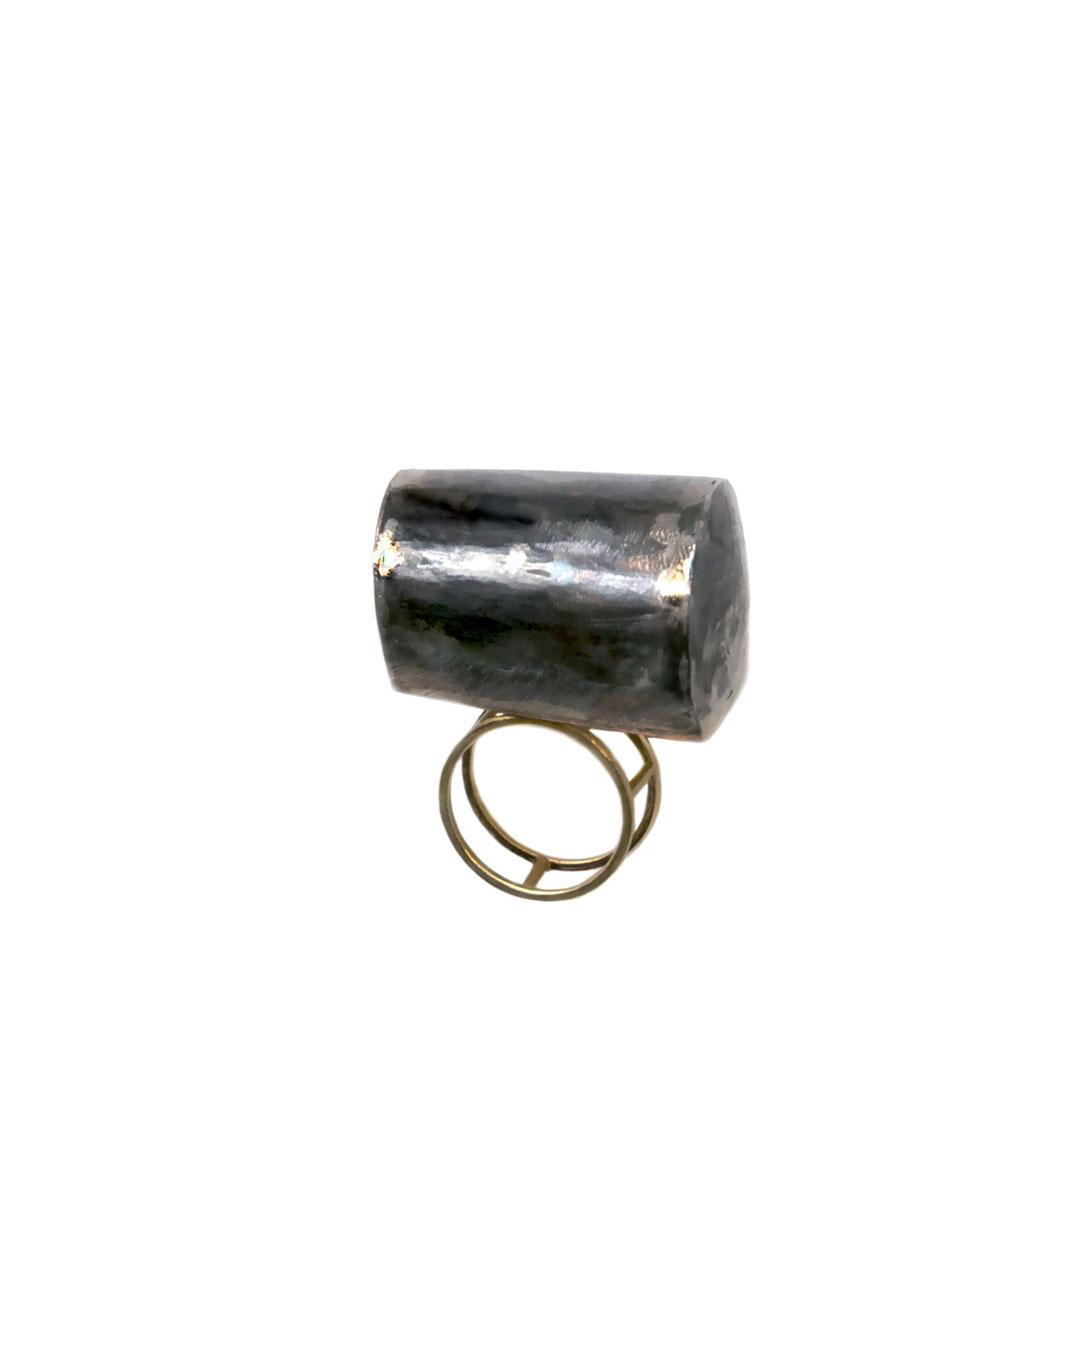 Stefano Marchetti, untitled, 2010, ring; steel, gold, 30 x 33 x 37 mm, €2500